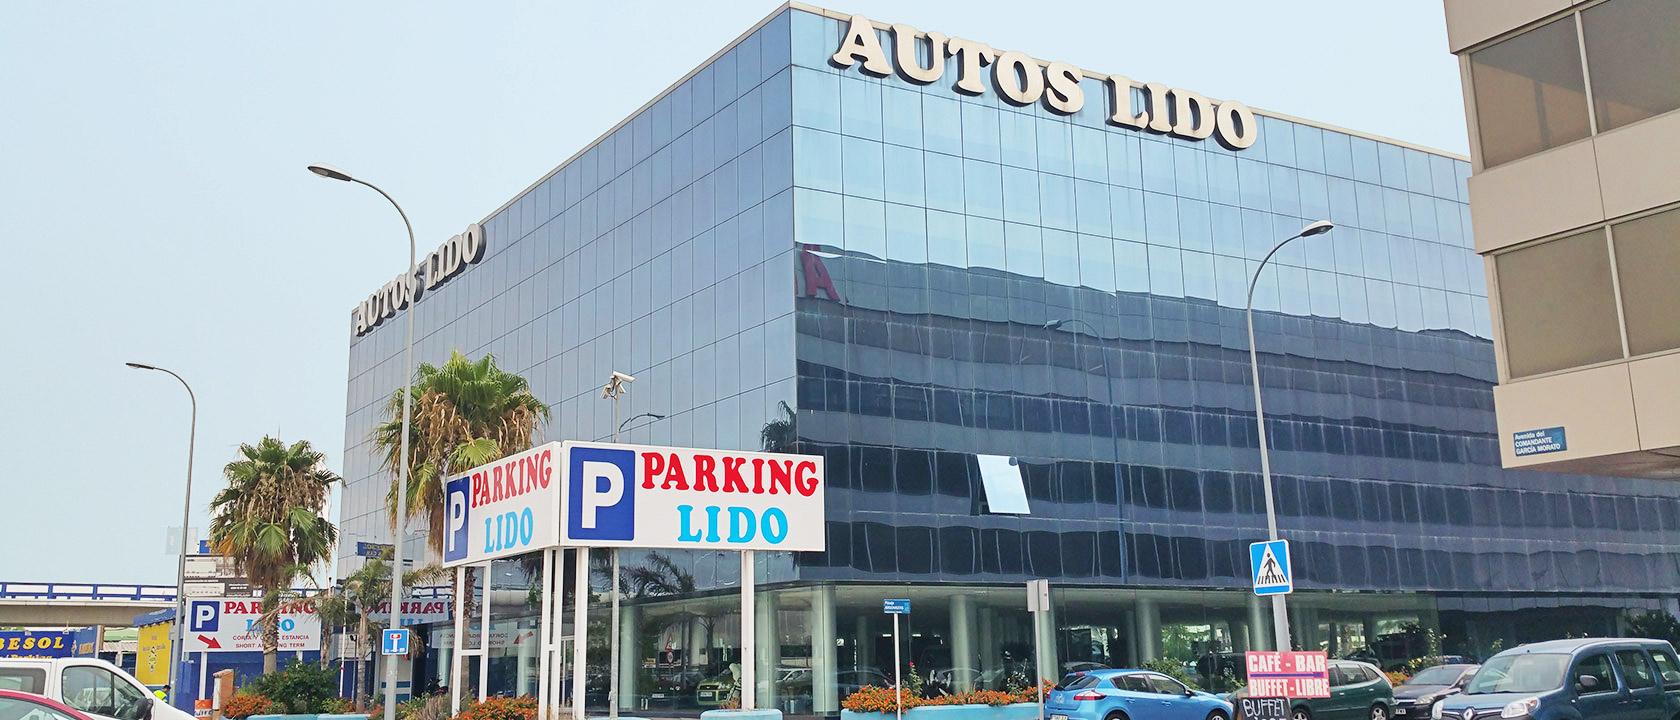 Parking Lido 1